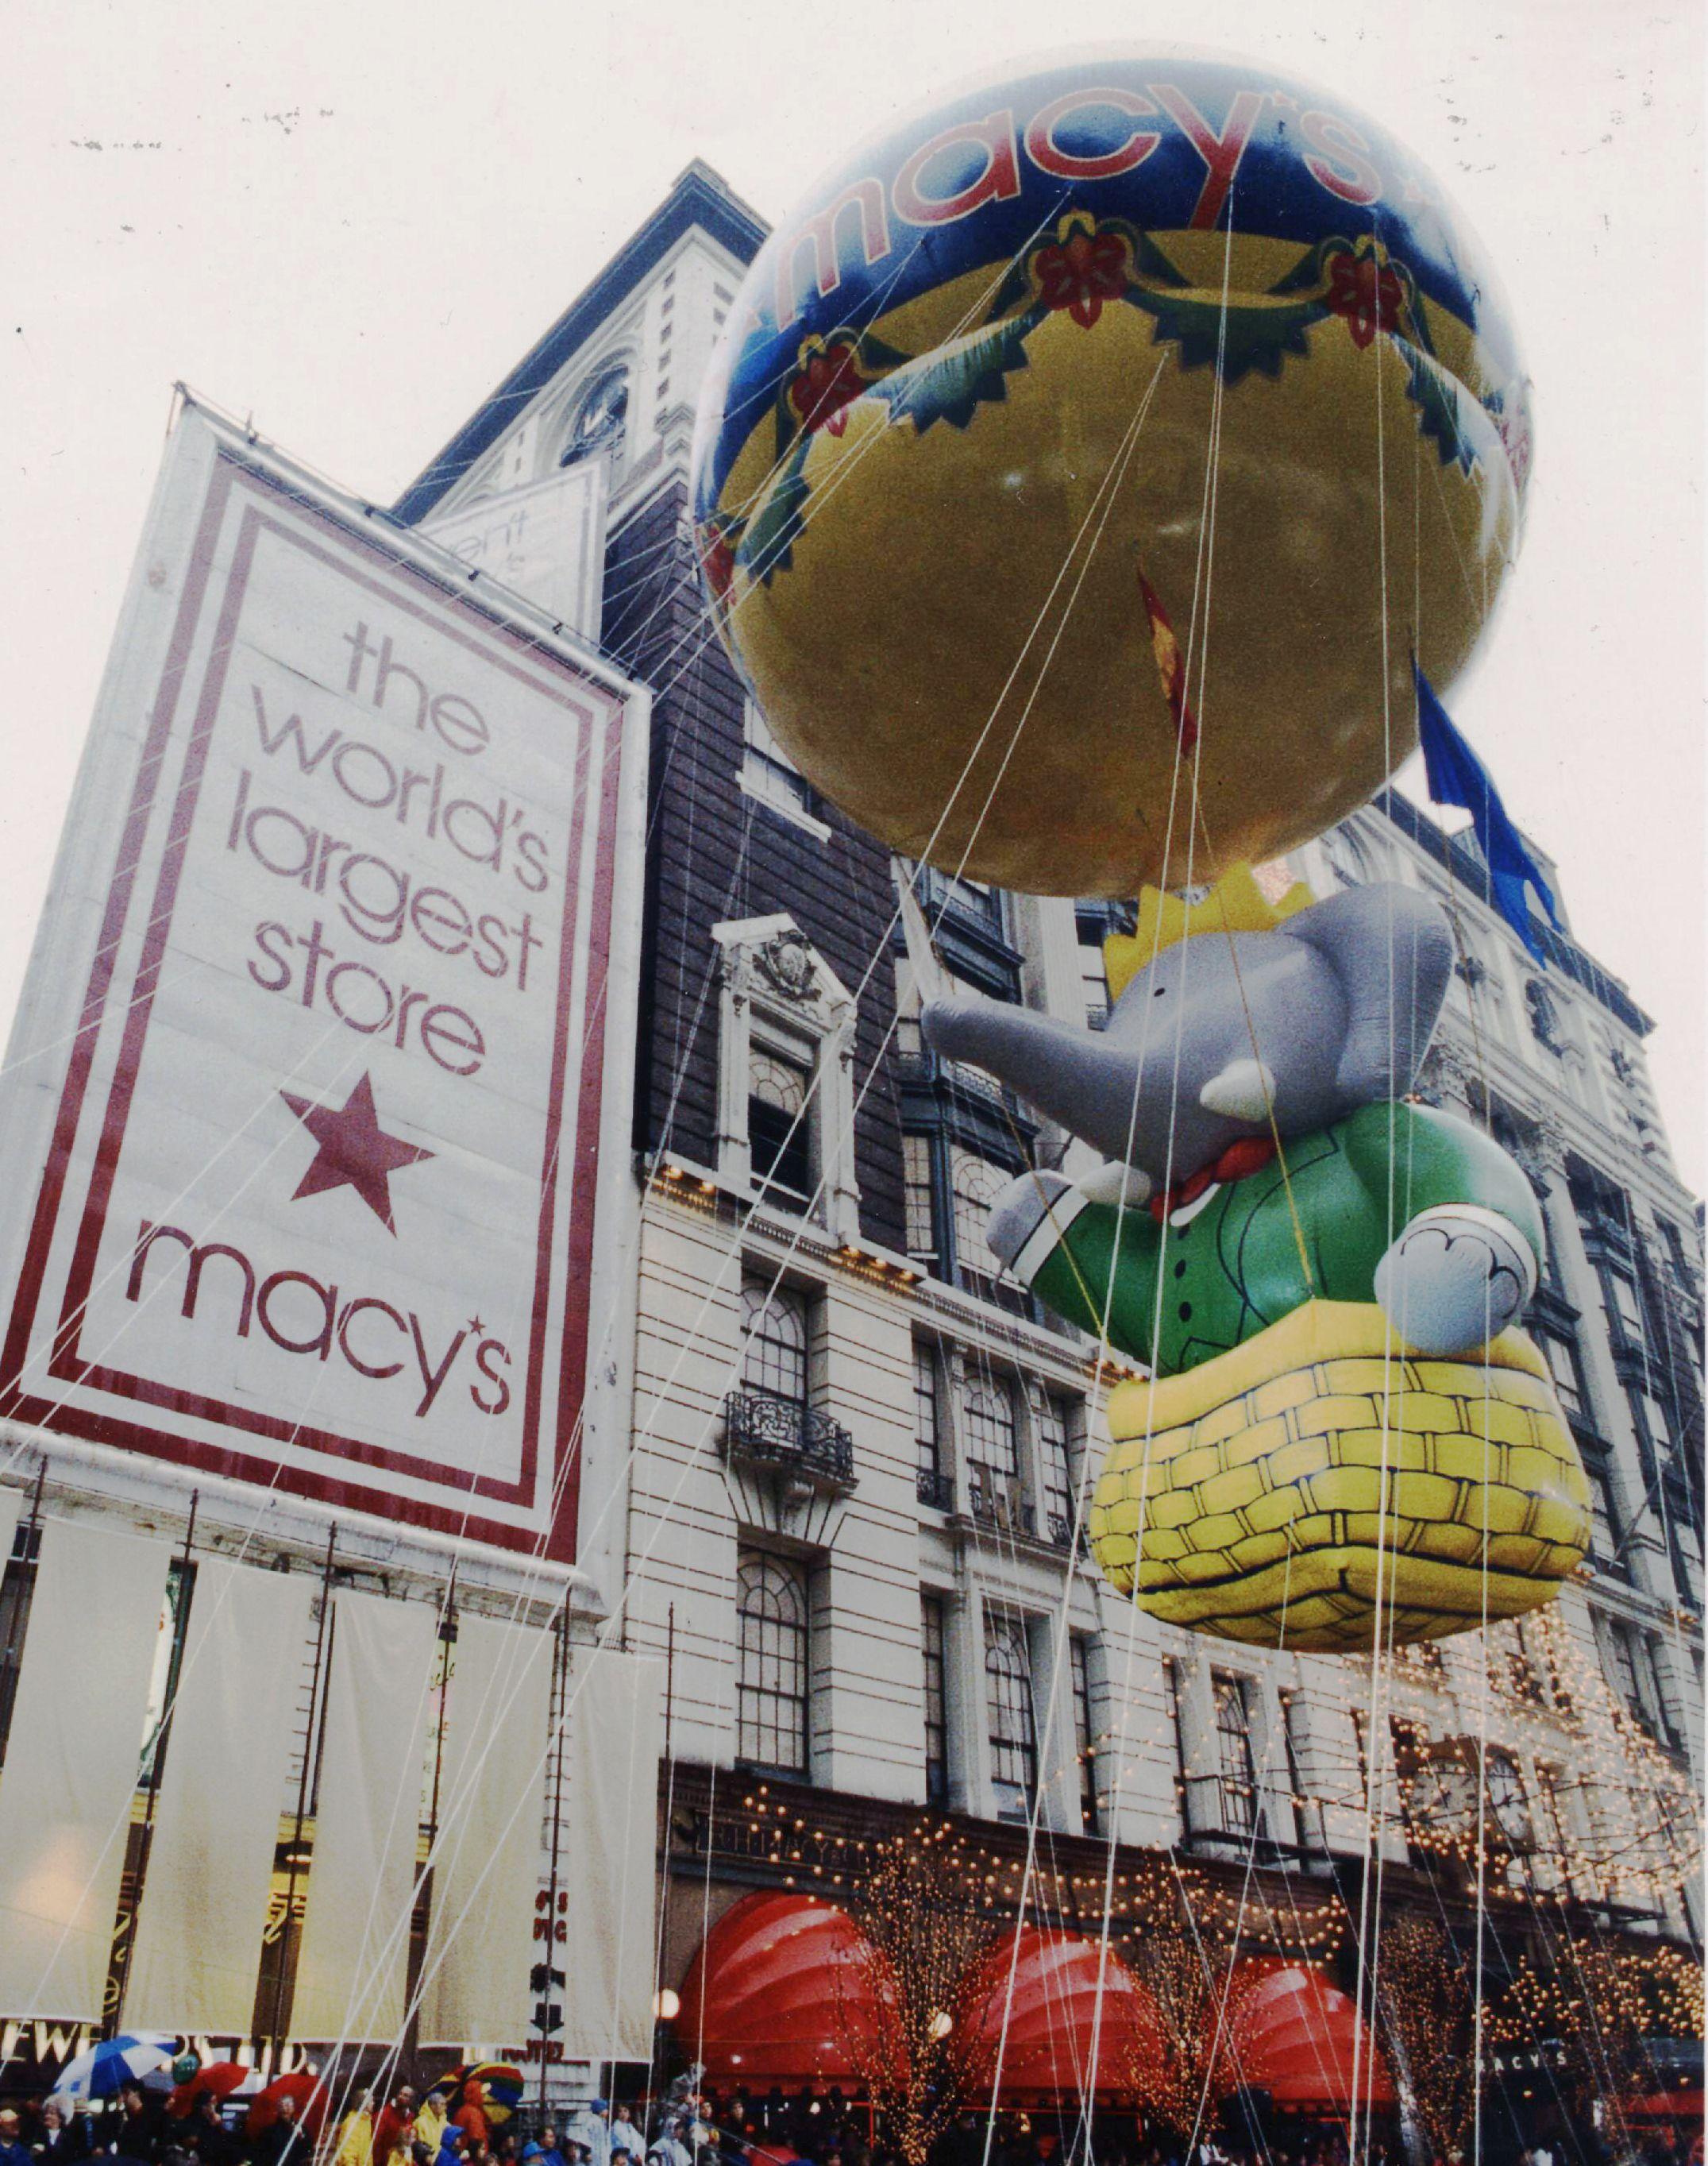 2015 Macy S Thanksgiving Day Parade Macys Thanksgiving Parade Macy S Thanksgiving Day Parade Macy S Thanksgiving Day Parade